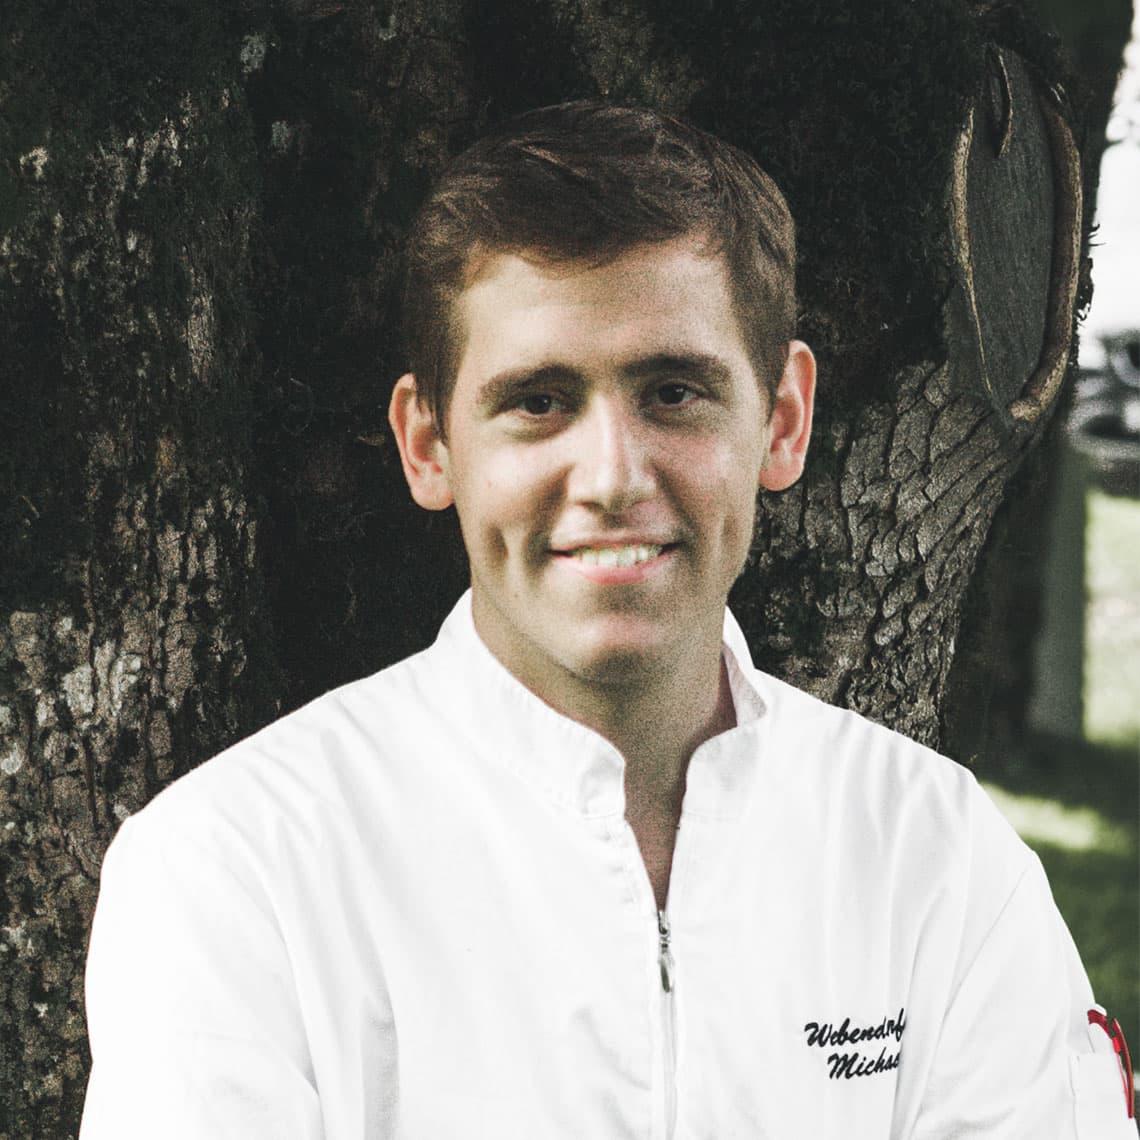 Michael Webendorfer